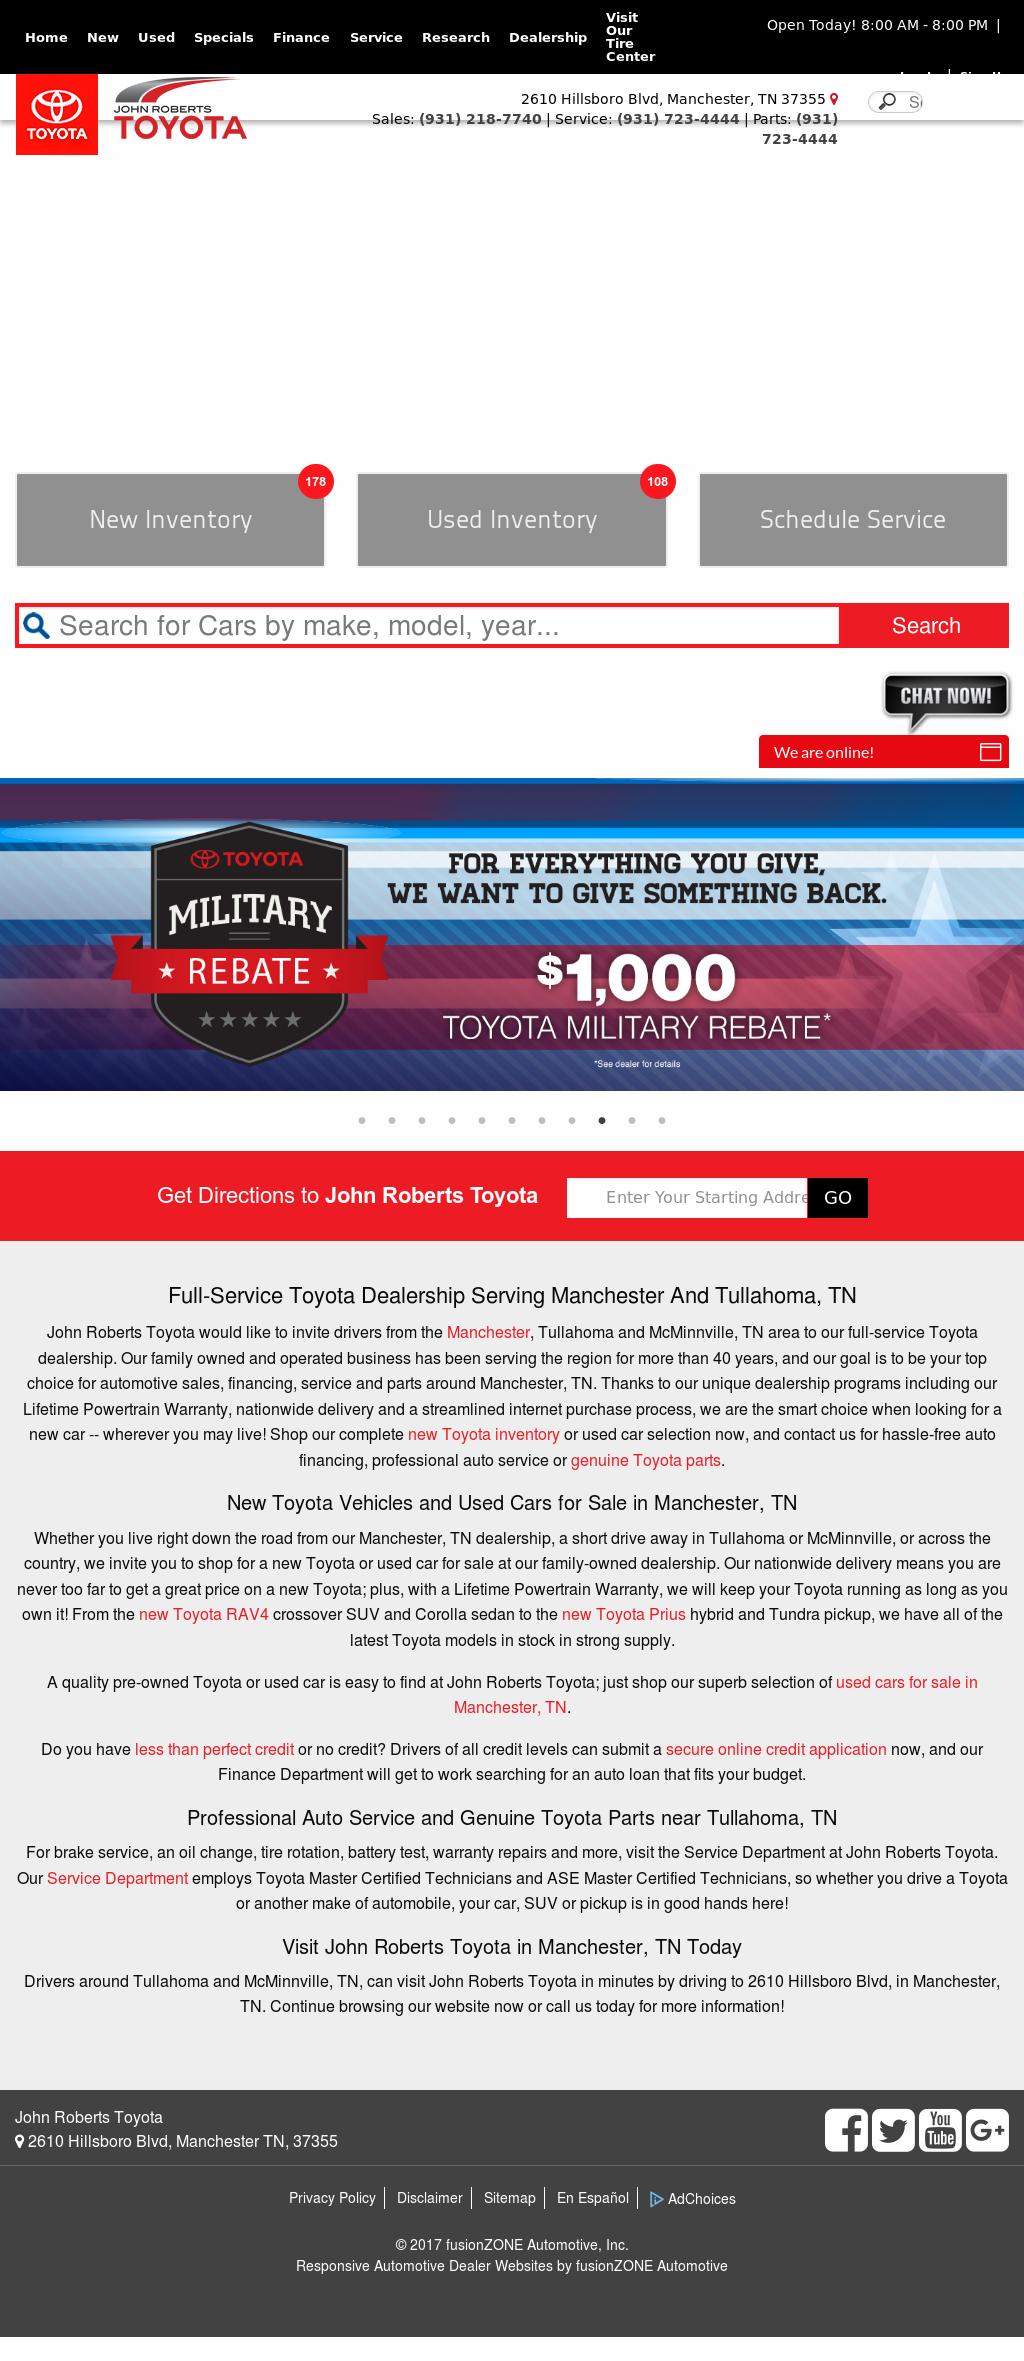 John Roberts Toyota Website History